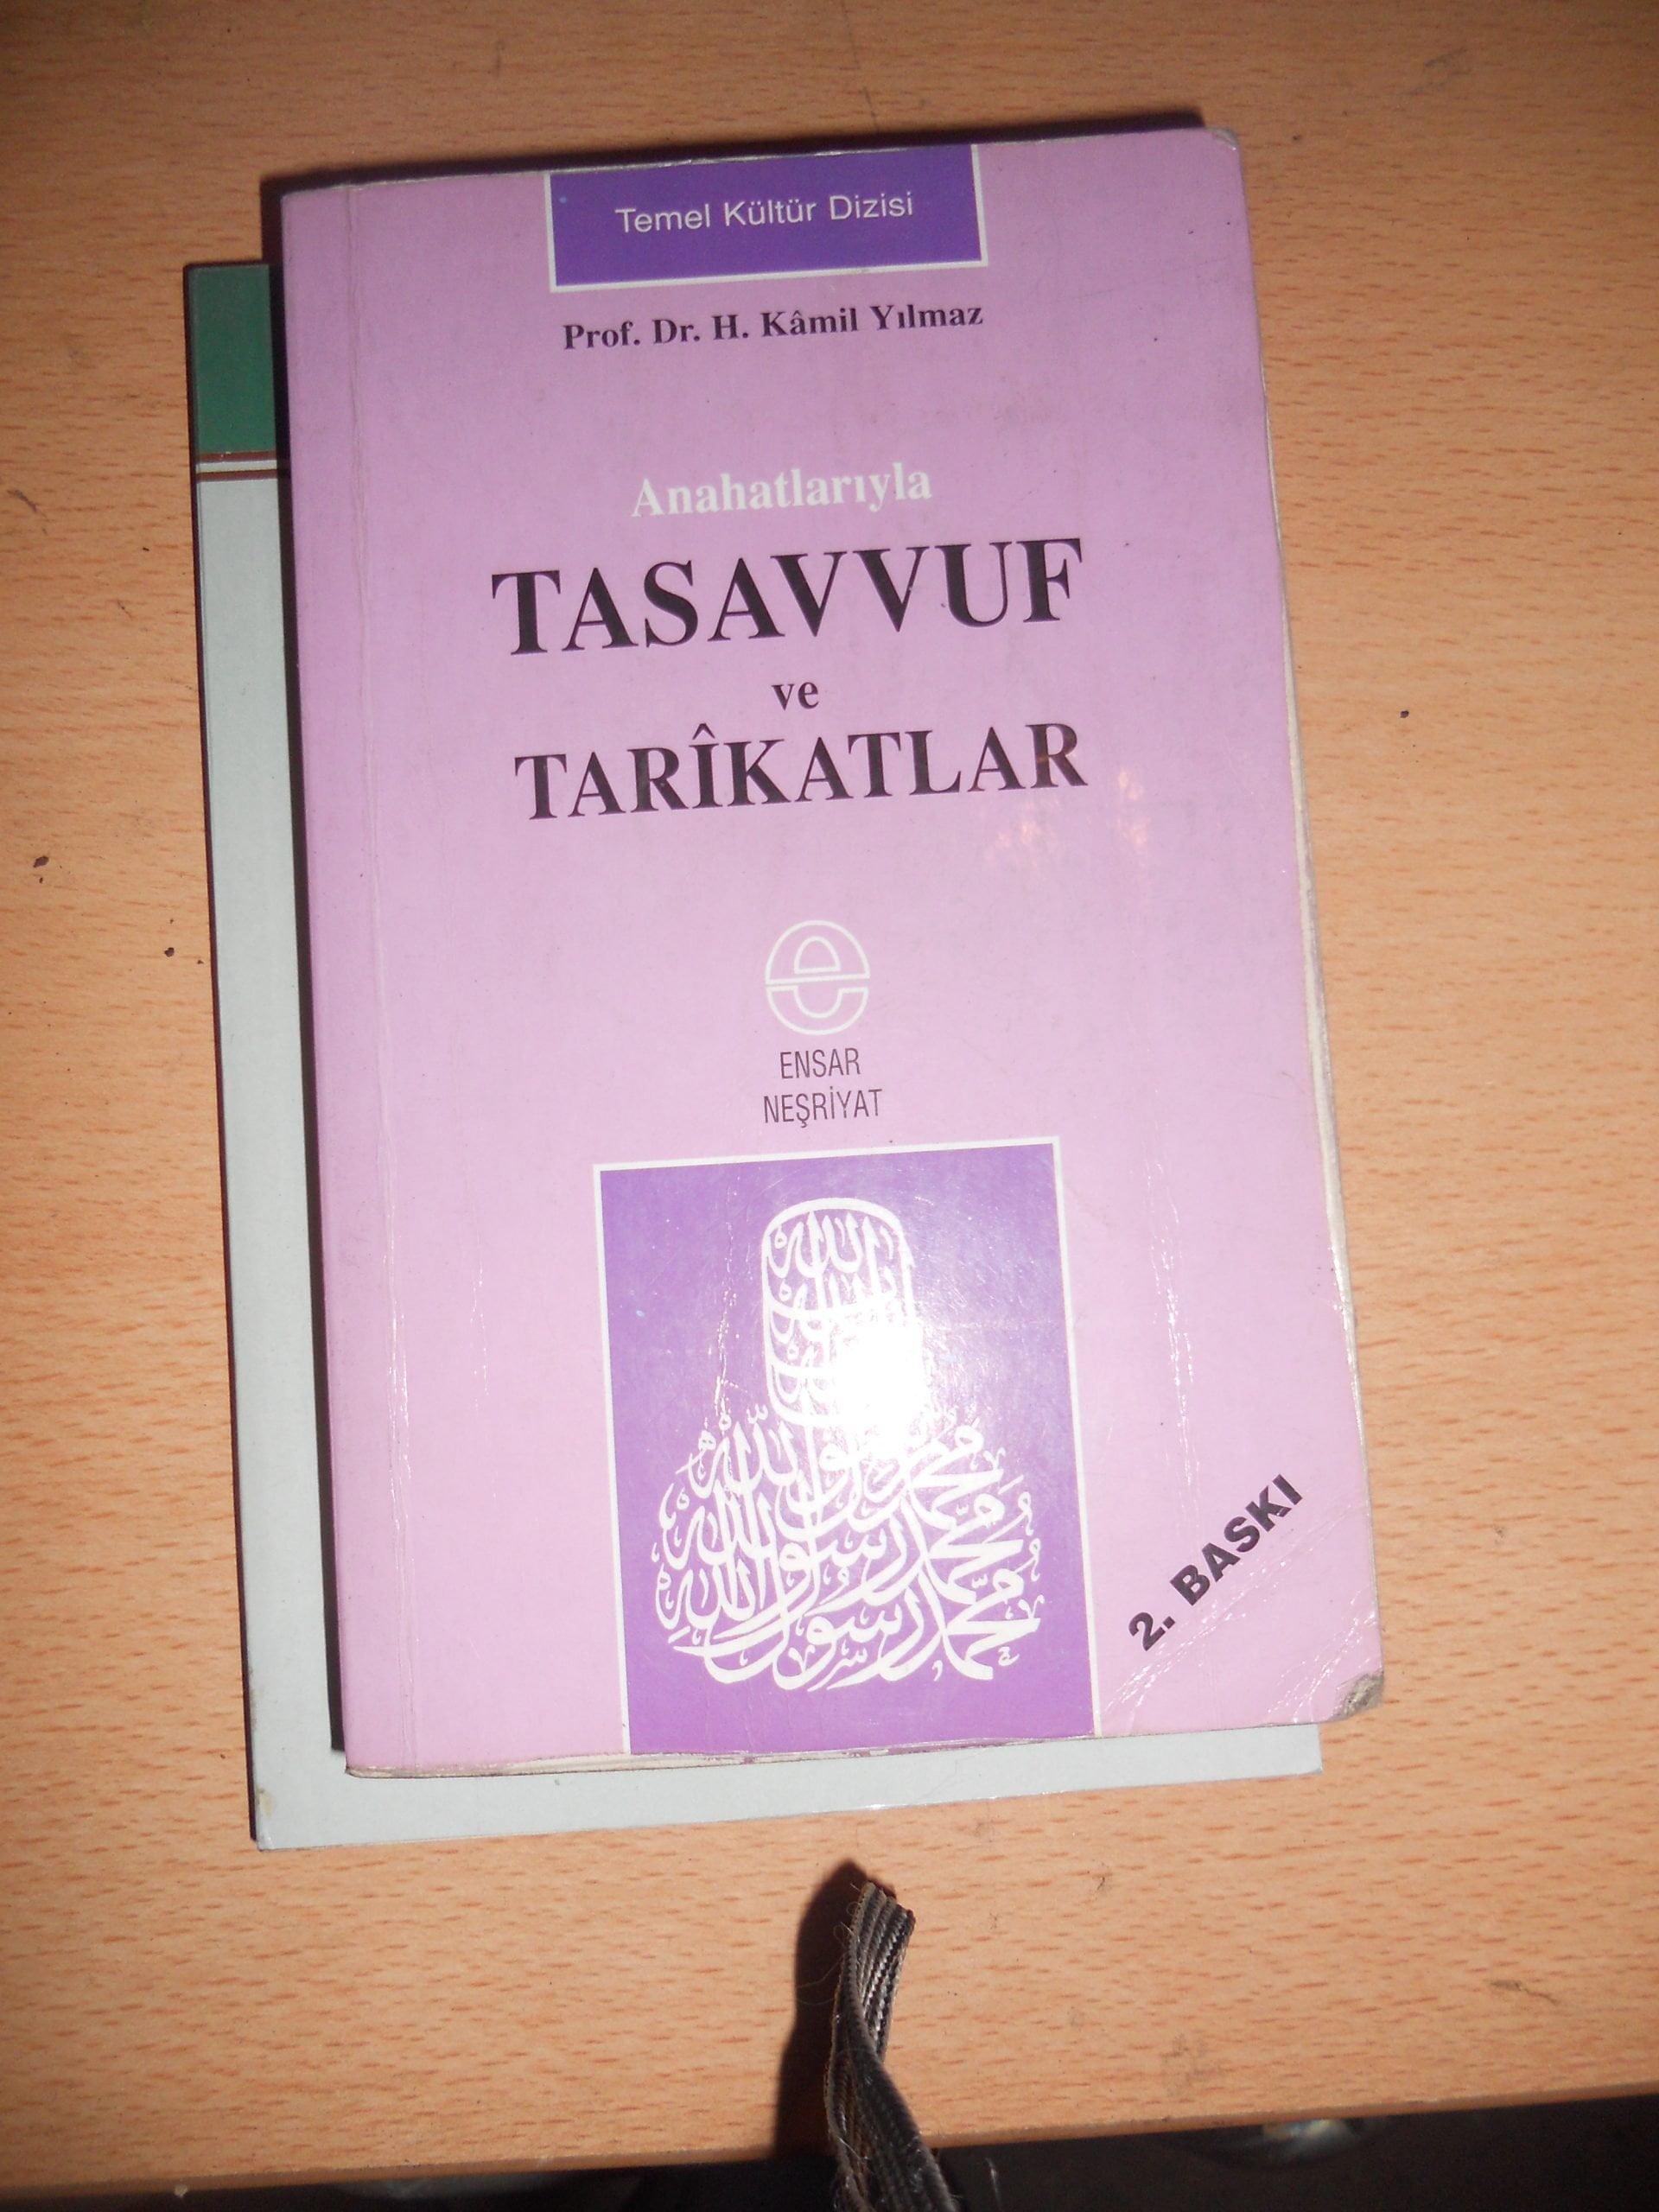 Anahatlarıyla TASAVVUF ve TARİKATLAR/Prof.dr.H.Kamil YILMAZ/15 TL